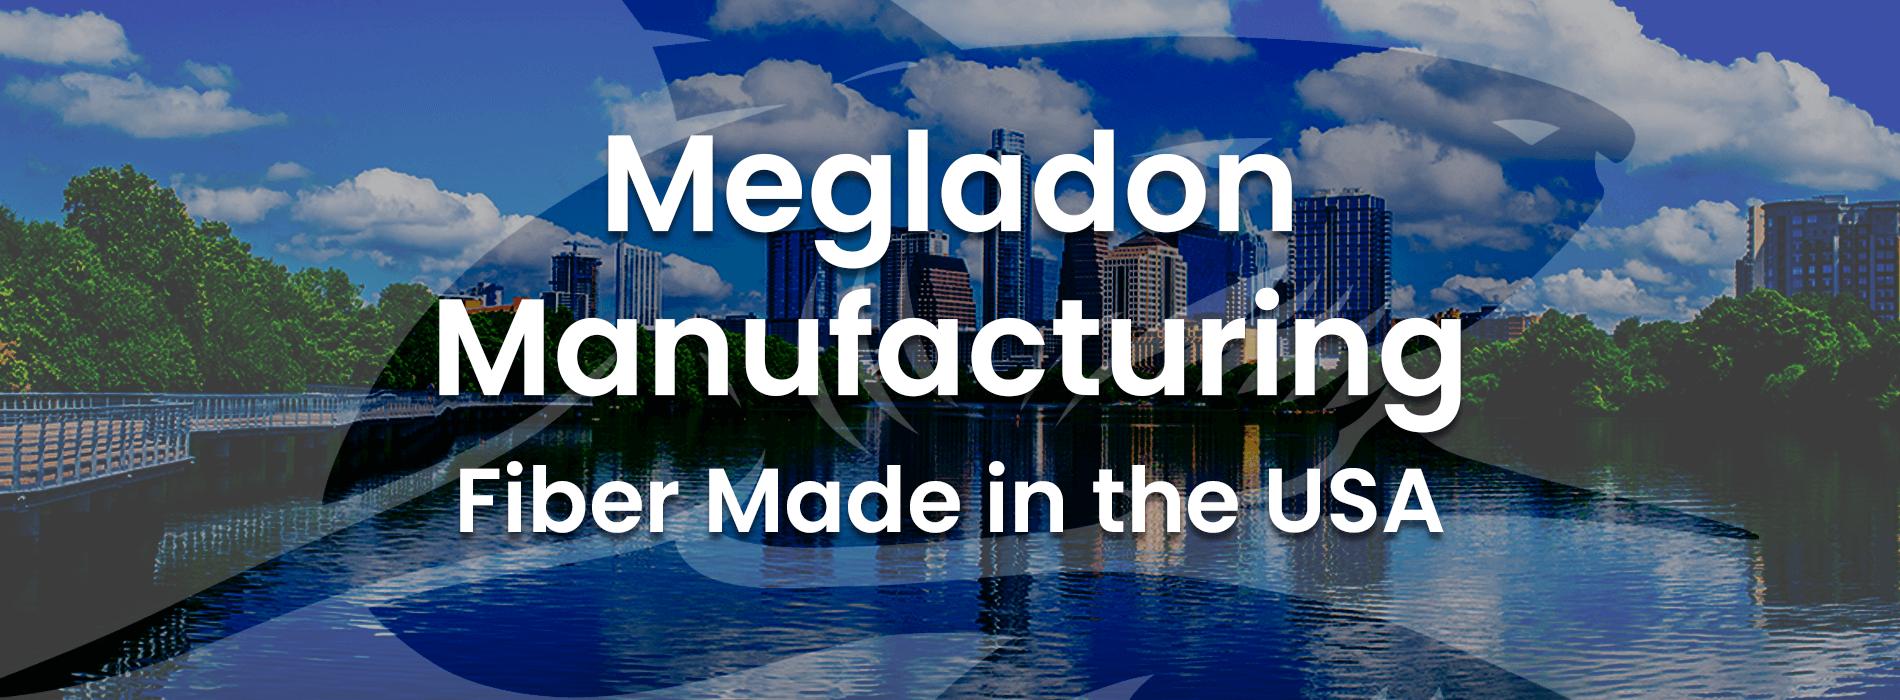 Megladon Fiber Optics - Products Made in the USA